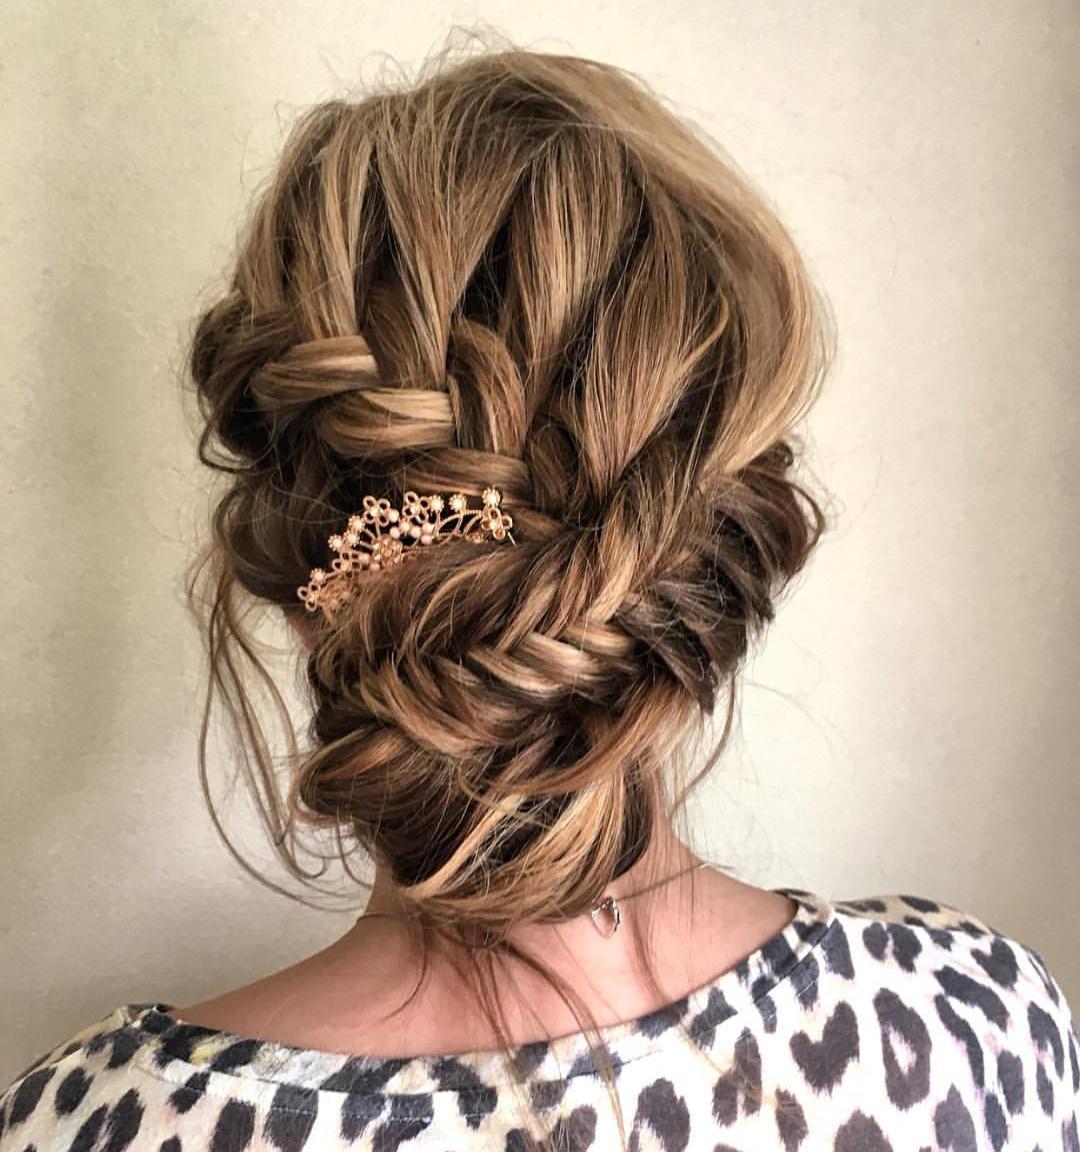 Trendy Updos for Medium Length Hair, Updo Hairstyle Ideas